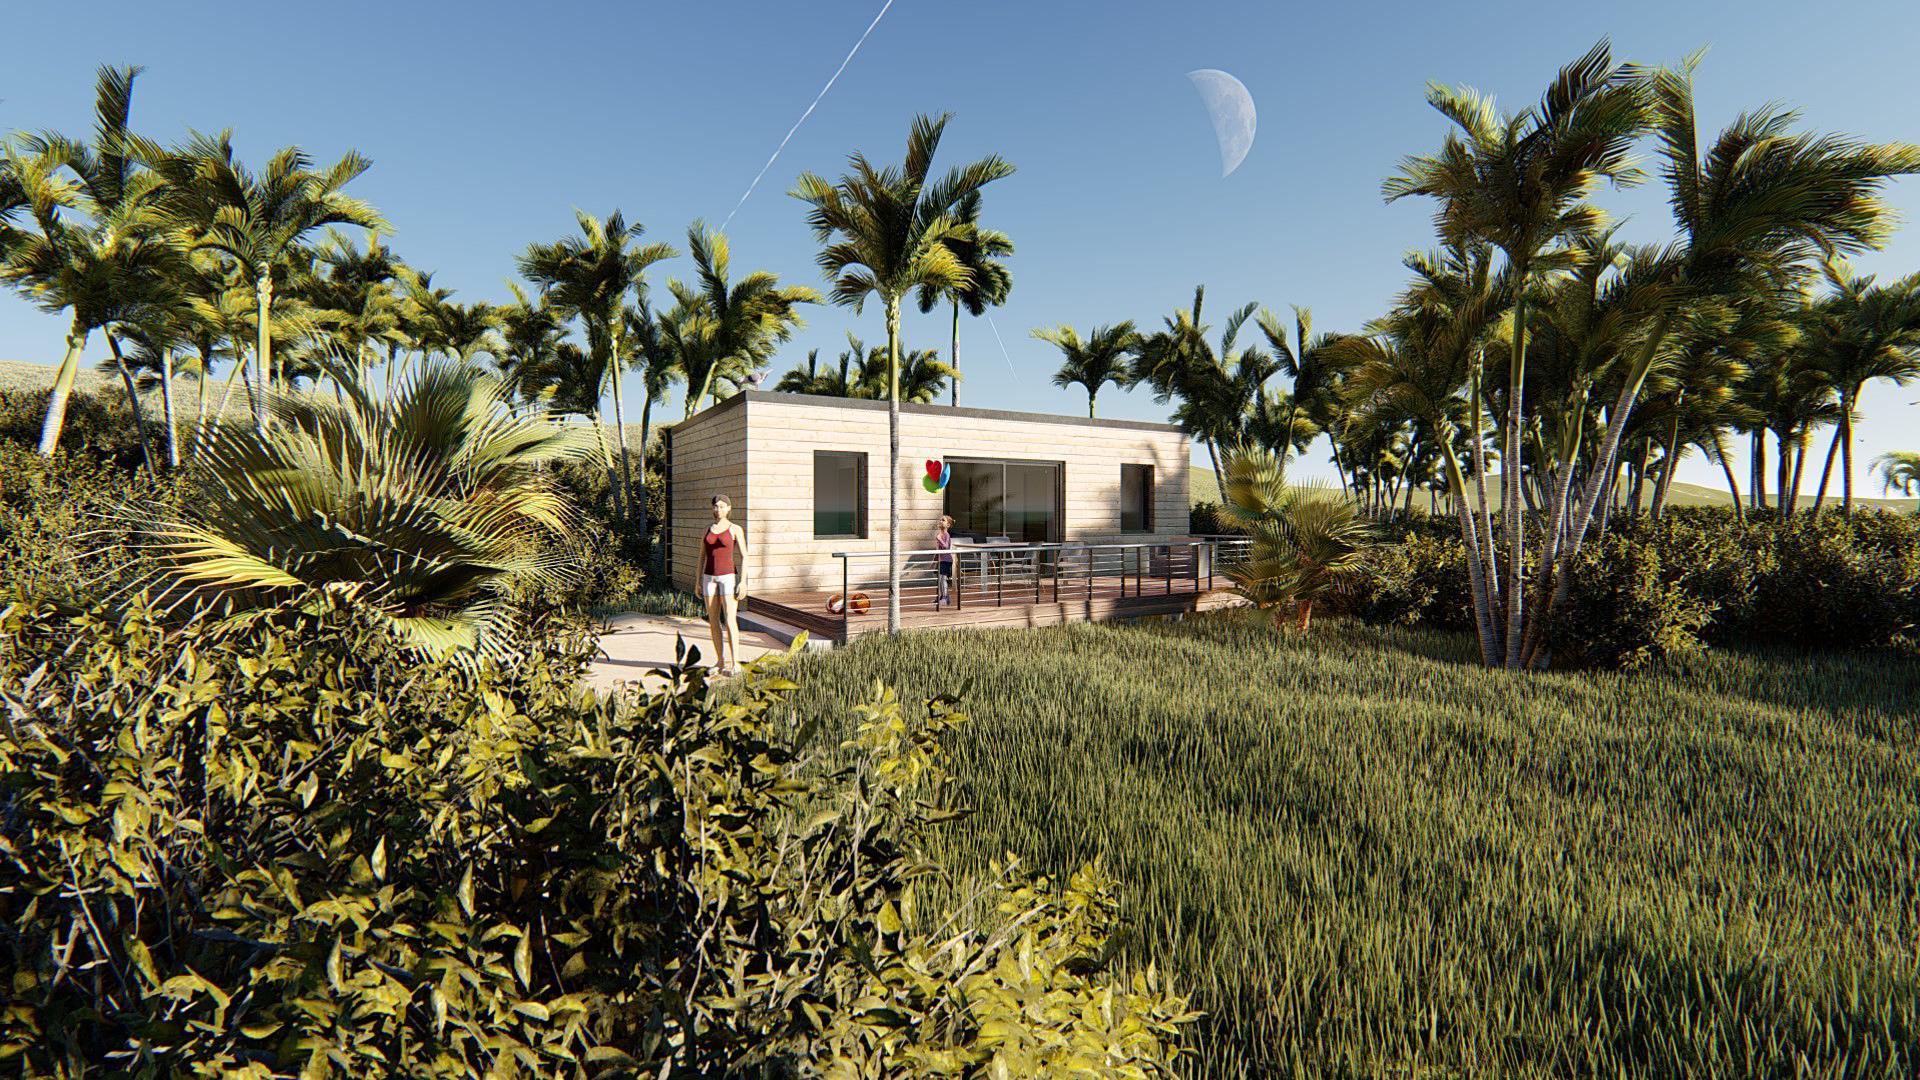 Studio de jardin 45 mobil home camping vue vegetation